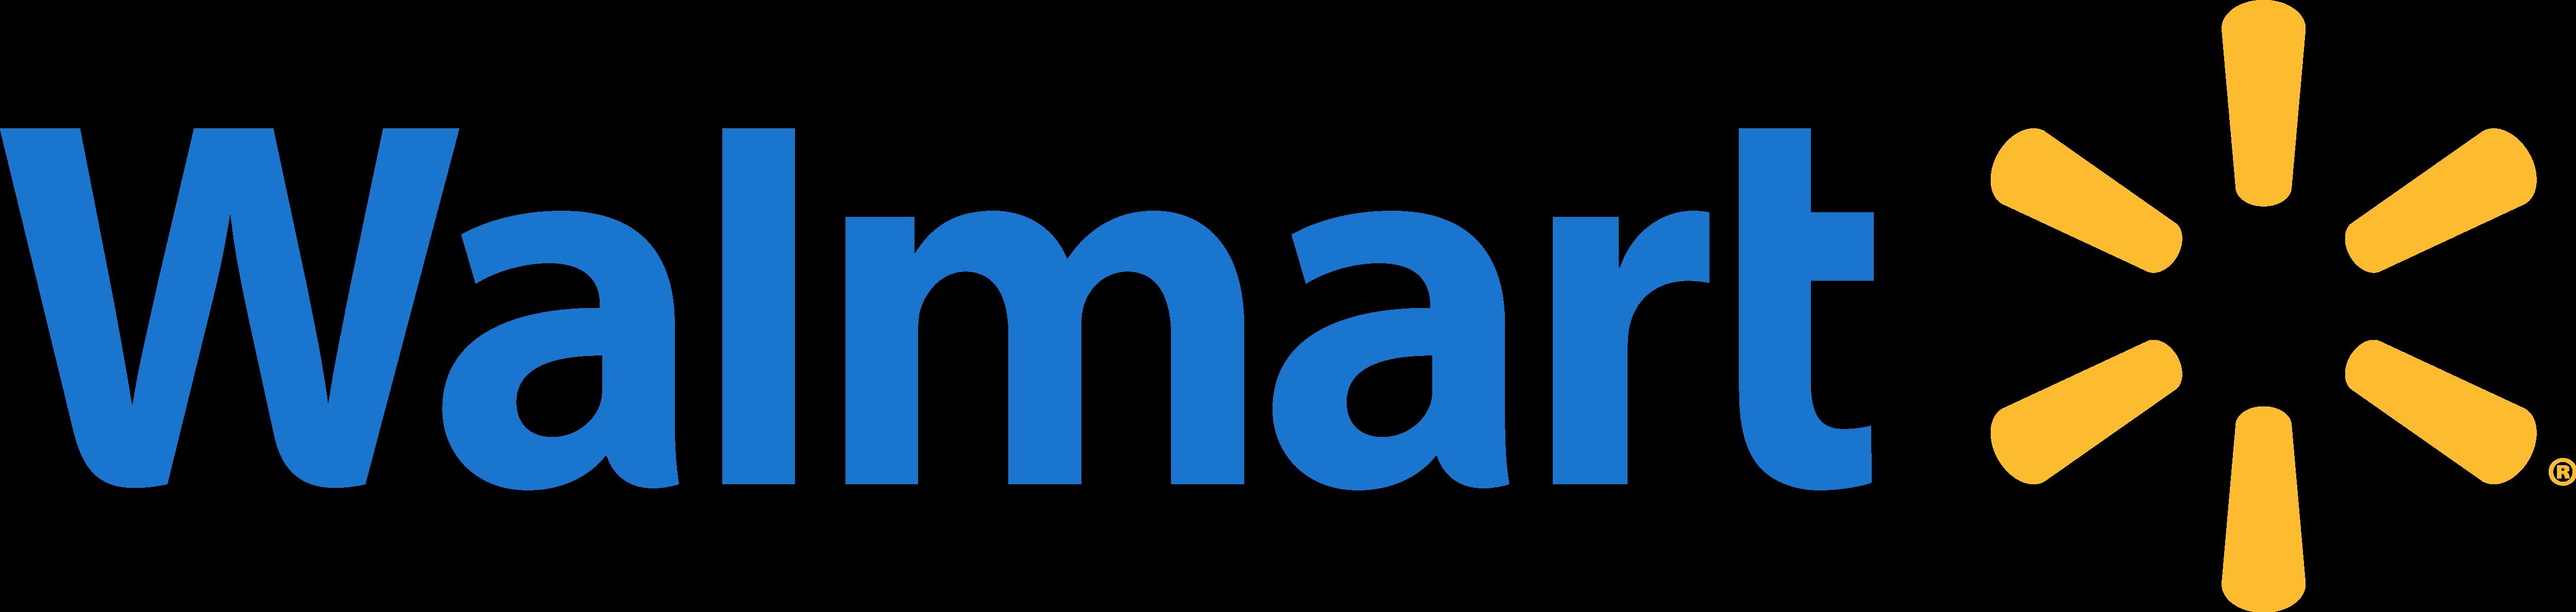 Walmart-logo-6